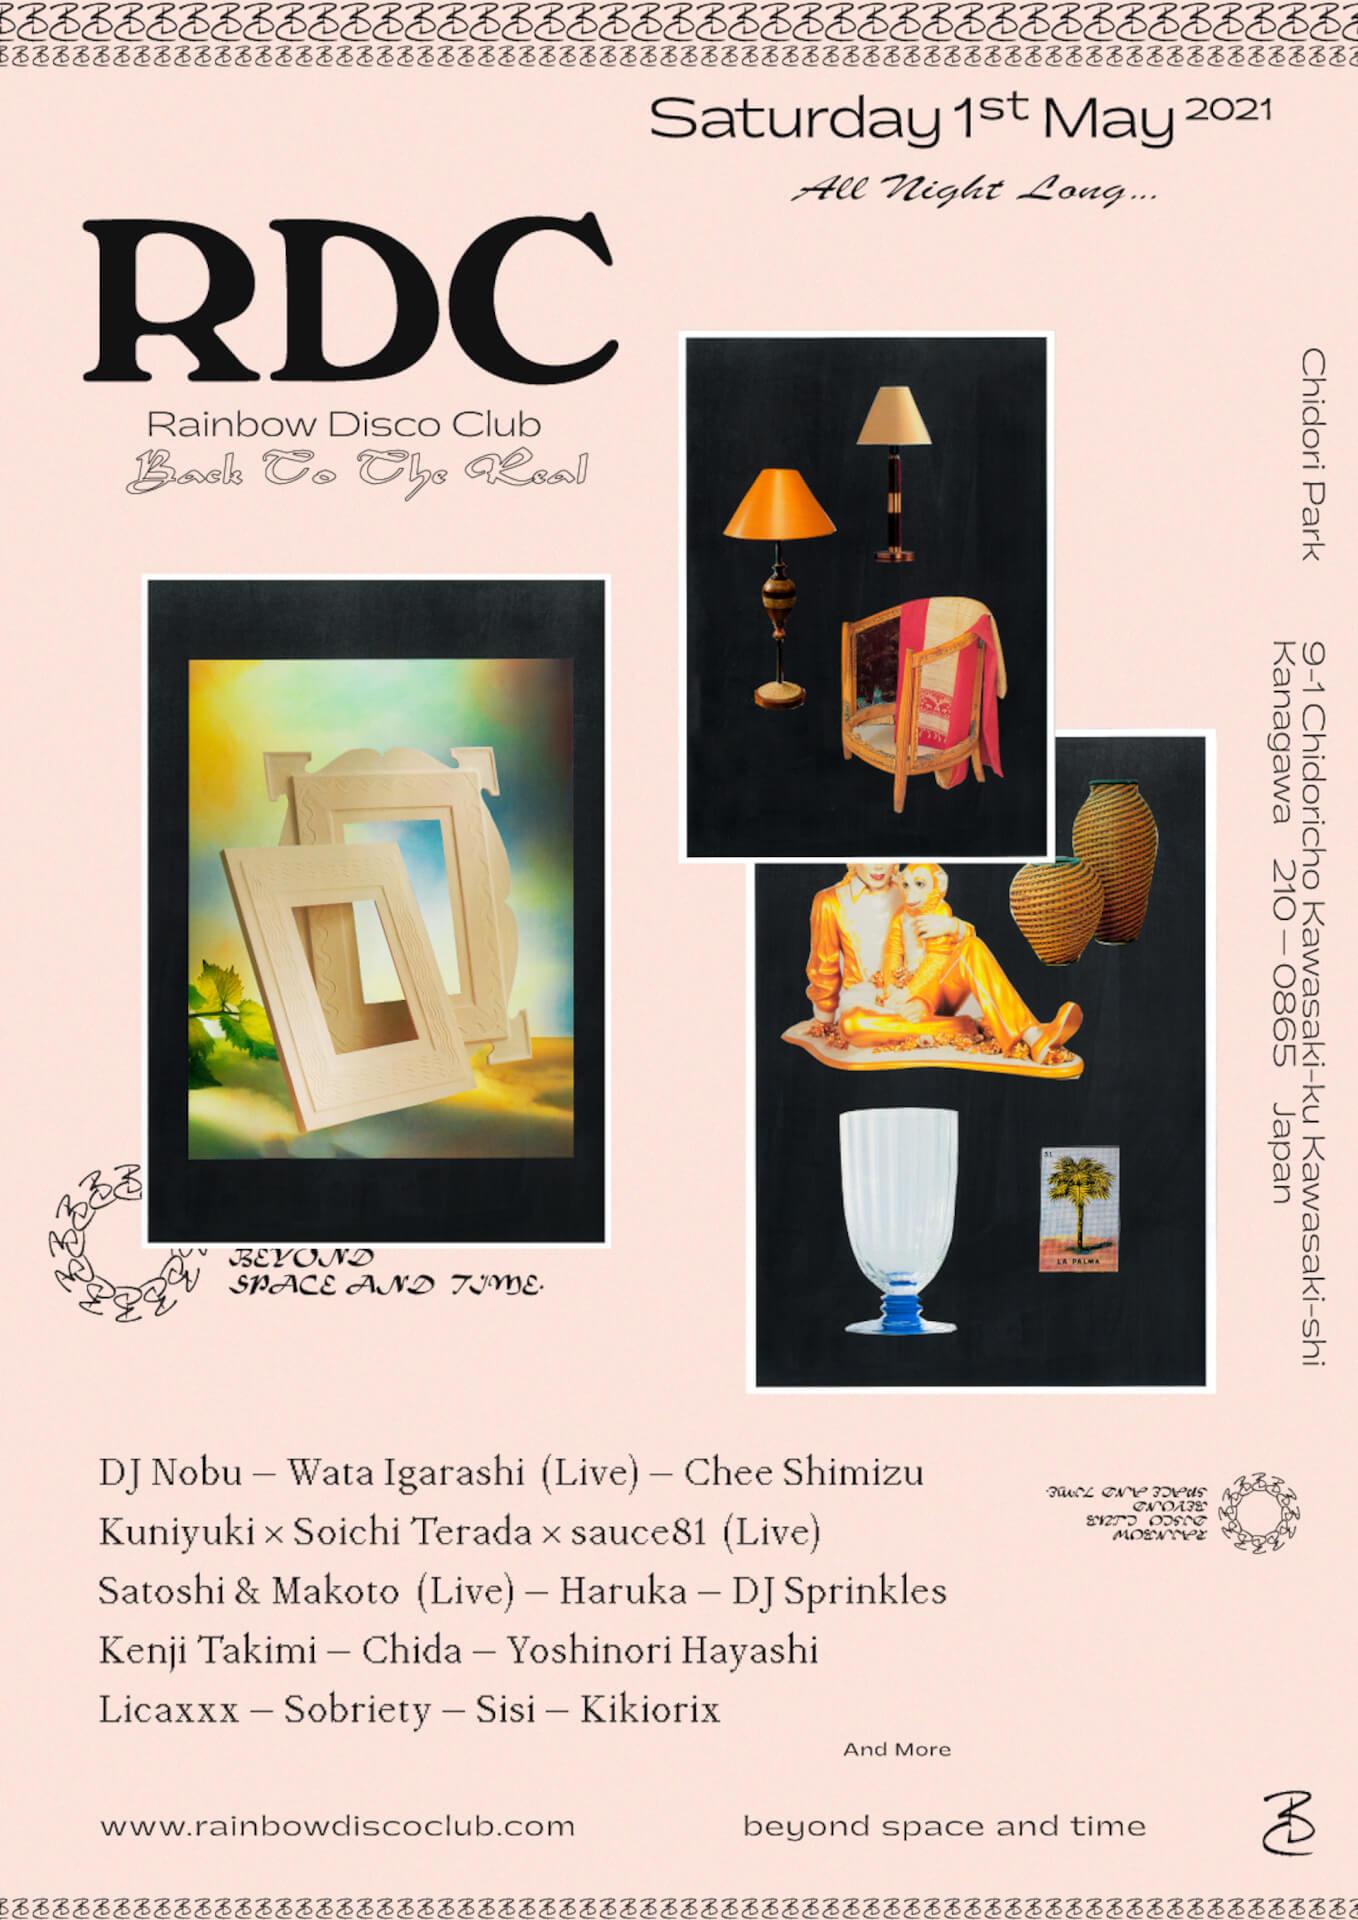 <RAINBOW DISCO CLUB>が初の野外オールナイト&7年ぶり都市型パーティーに!DJ Nobu、Wata Igarashi、Licaxxx、Sauce81ら第1弾ラインナップ発表 music210318_rdc2021_1